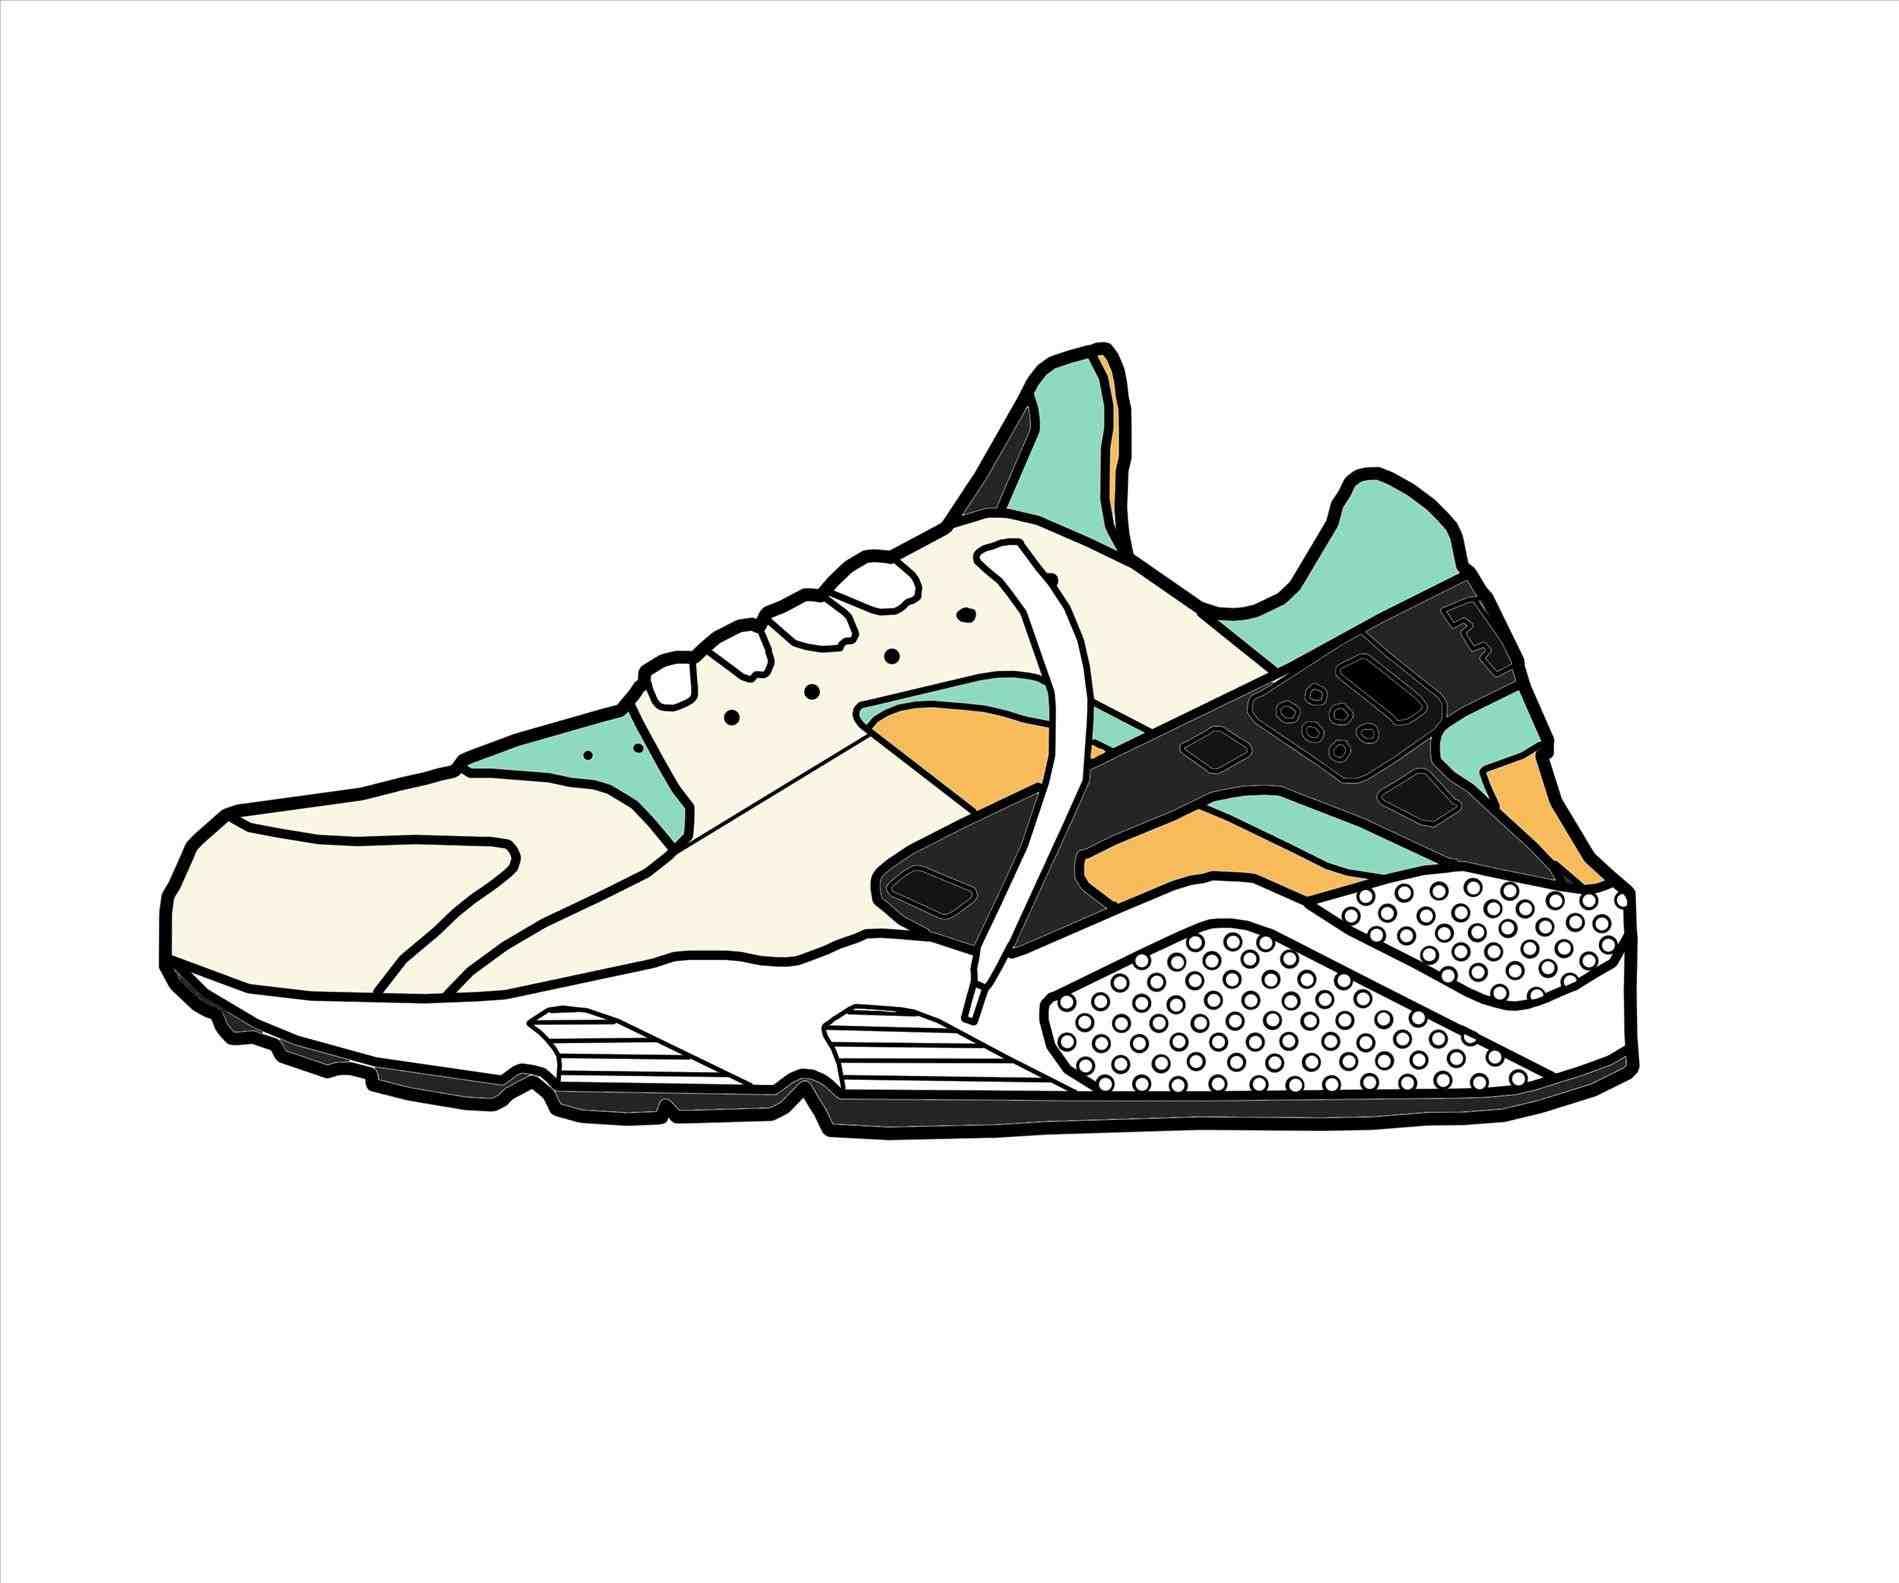 4ca48bf12643 ... hot 1899x1583 cartoon nike shoes drawing c9c16 b841d